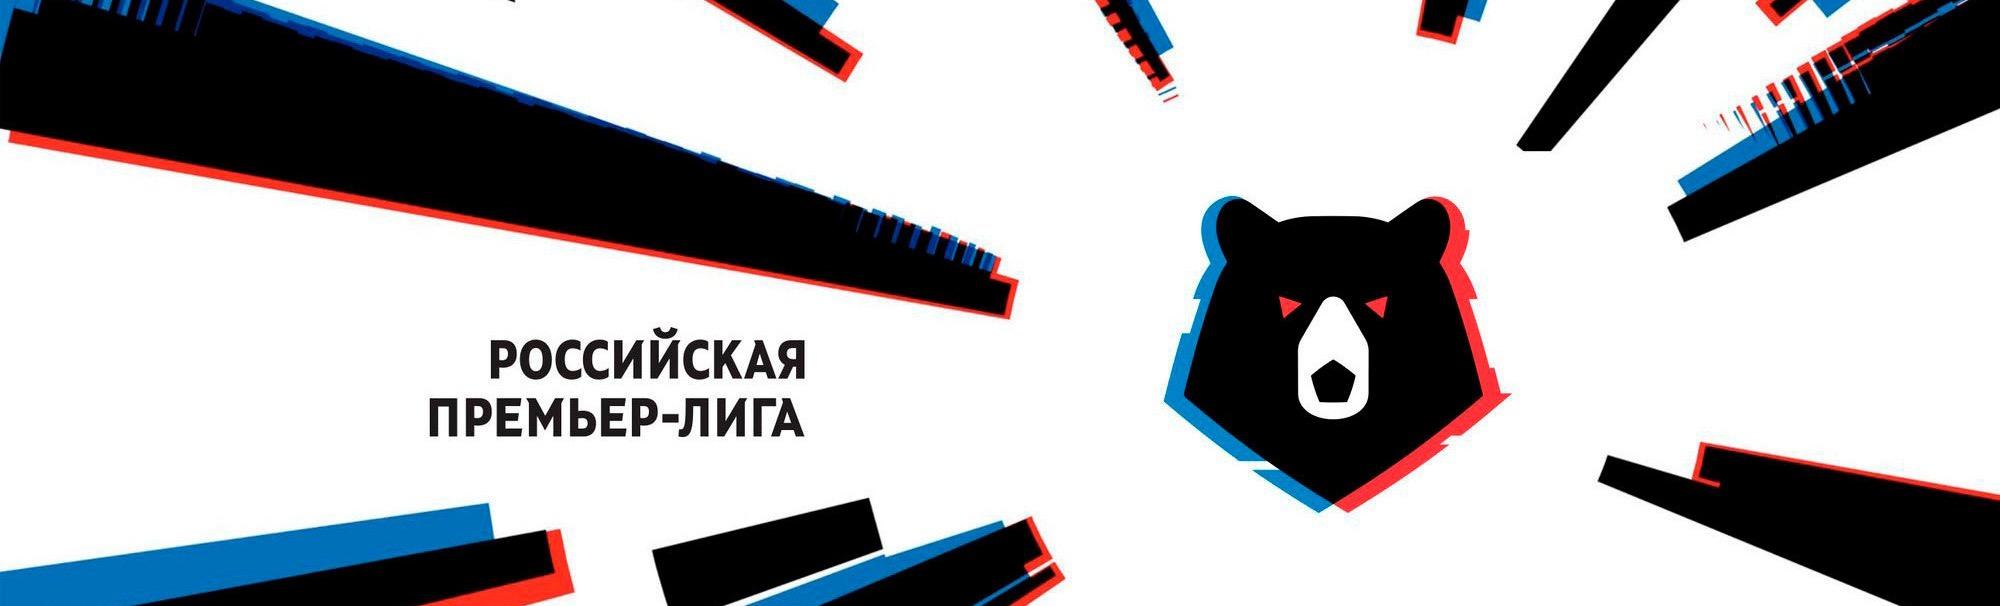 "Тамбов - Локомотив стадион ""Мордовия Арена"""